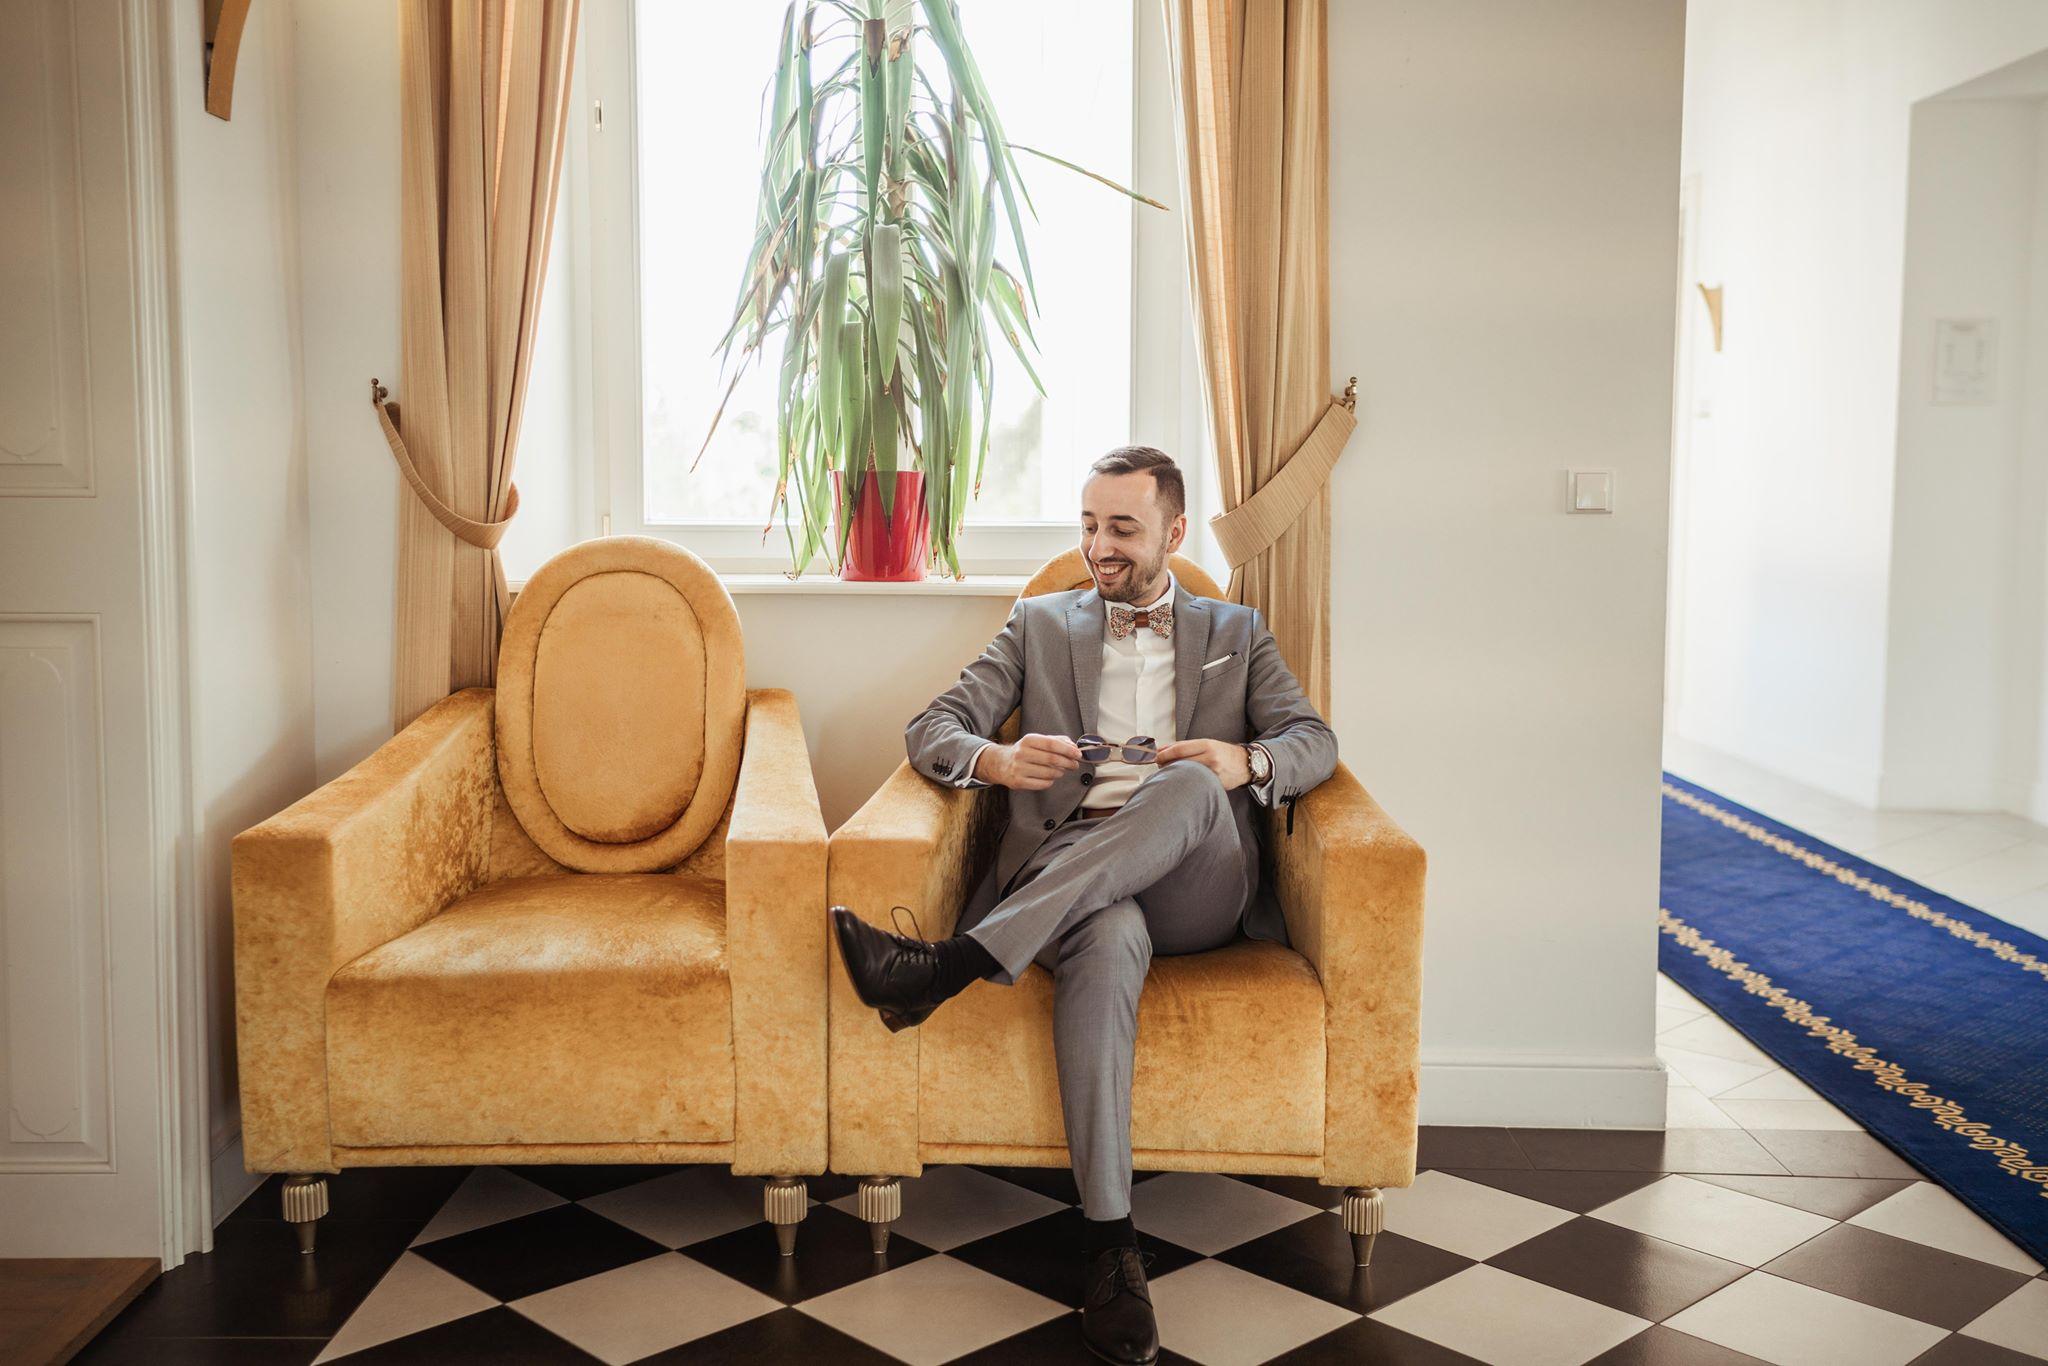 DJ-Mike-skusenosti-referencie-cena-wigerova-art-hotel-villa-necasjpg